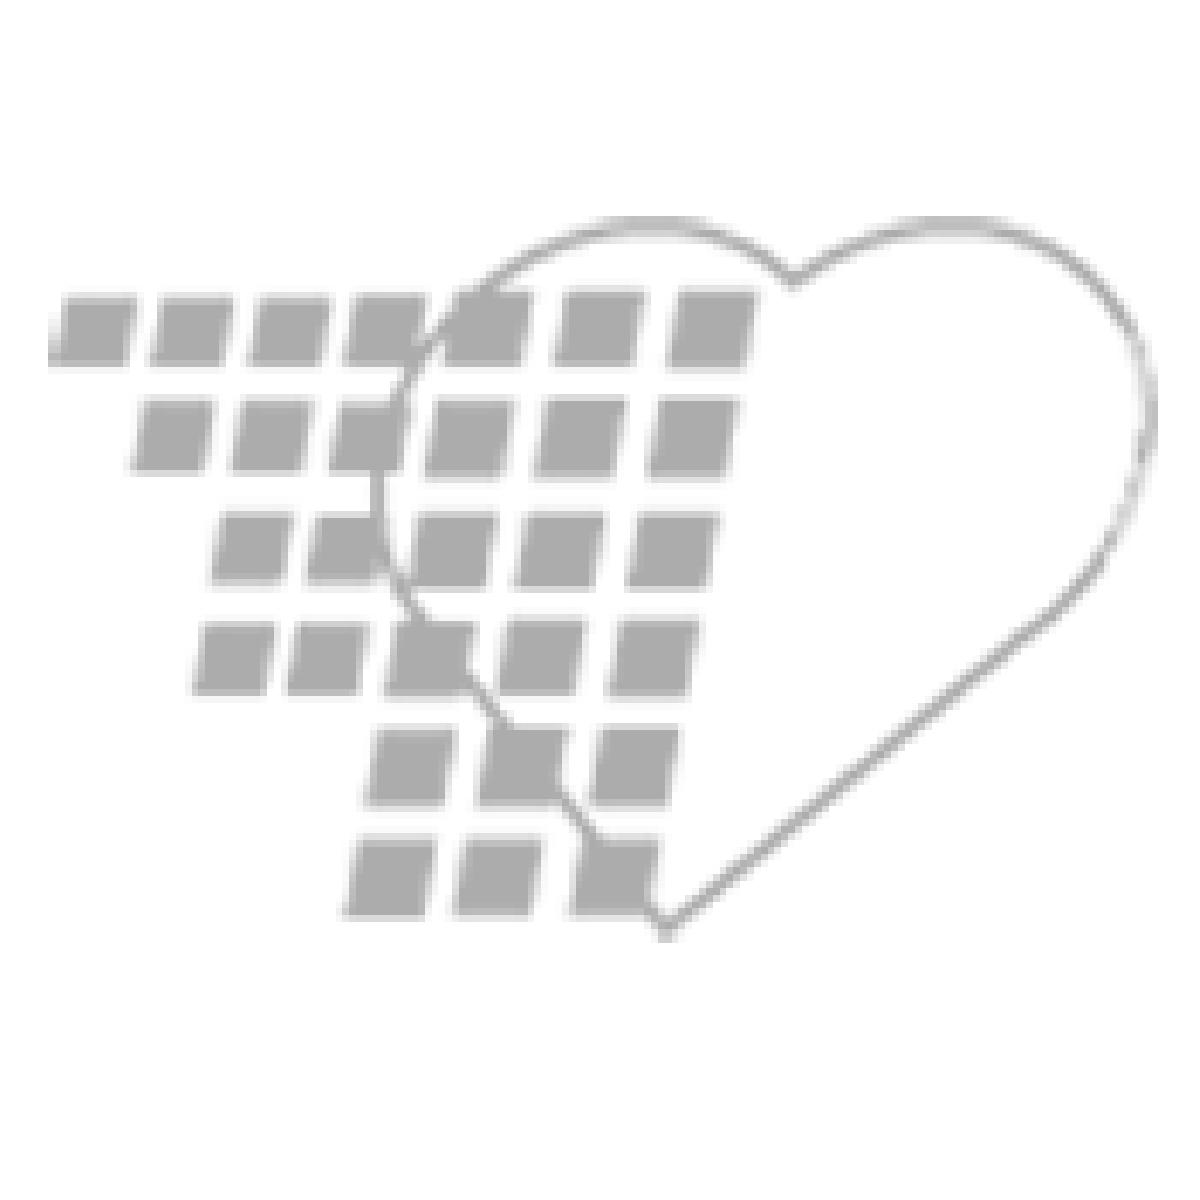 11-81-0100-WH - Little Anne QCPR Manikin - White